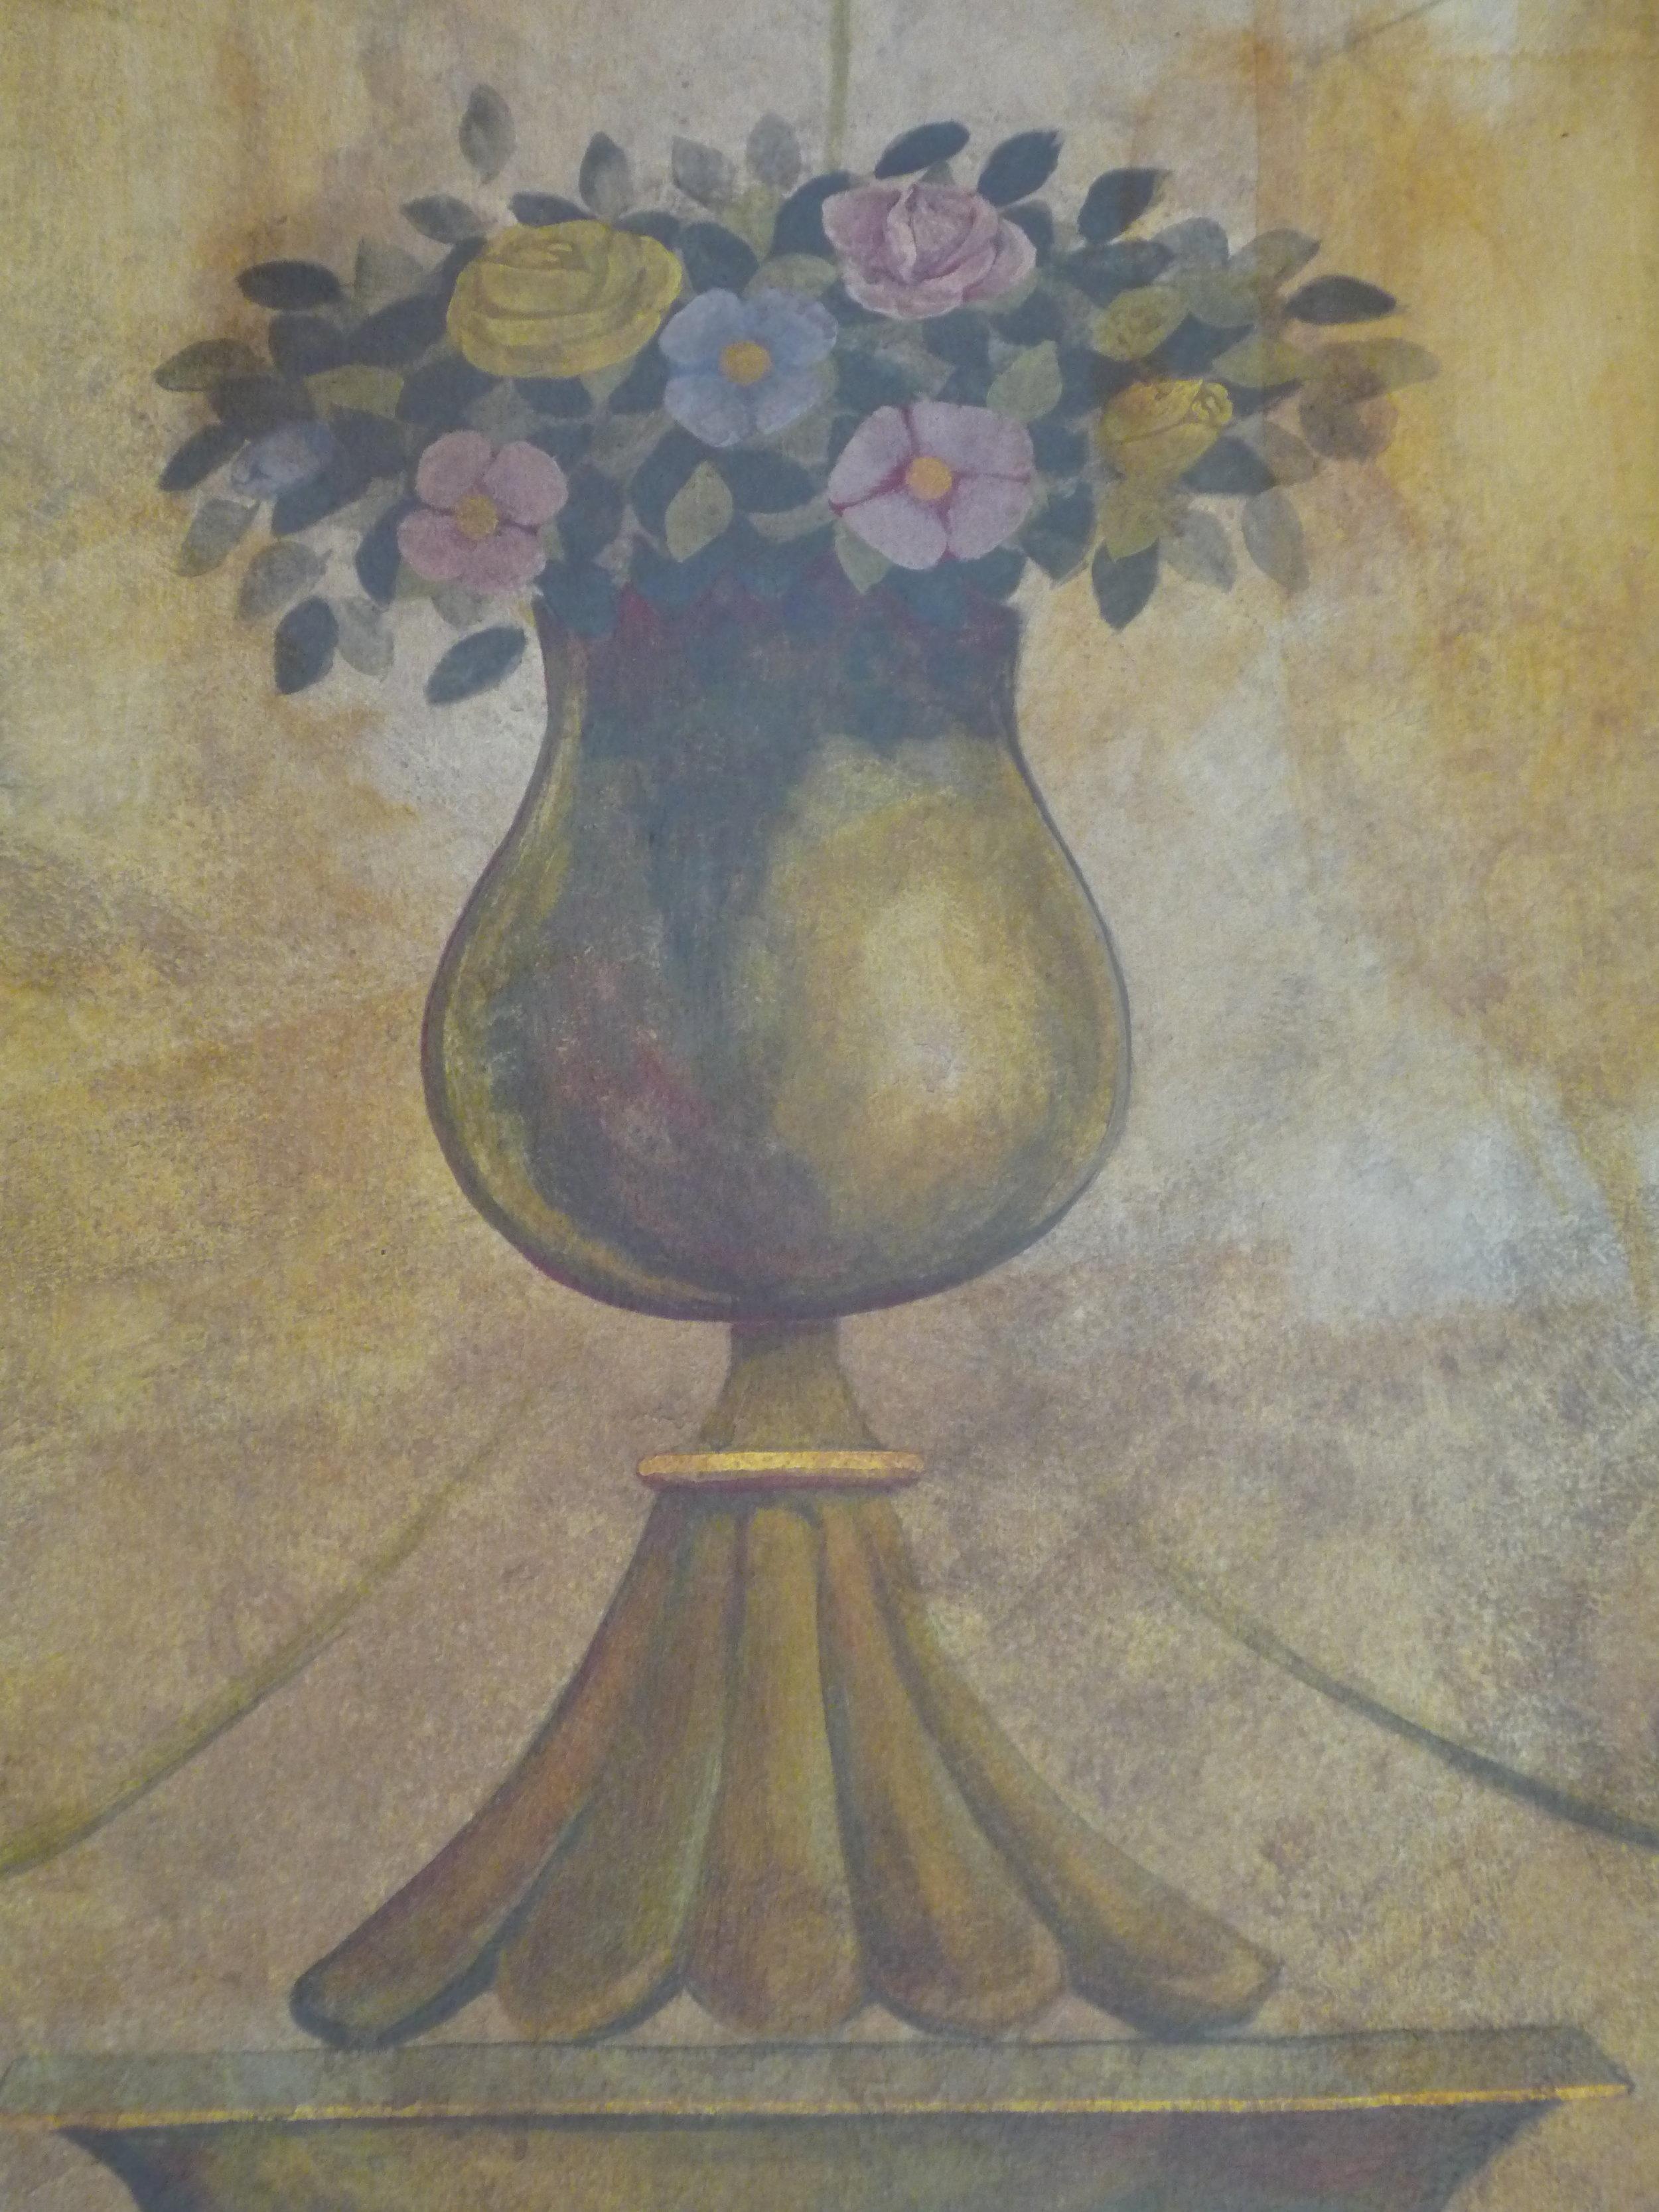 ORIG-mantle-vase-detail_4306542289_o.jpg